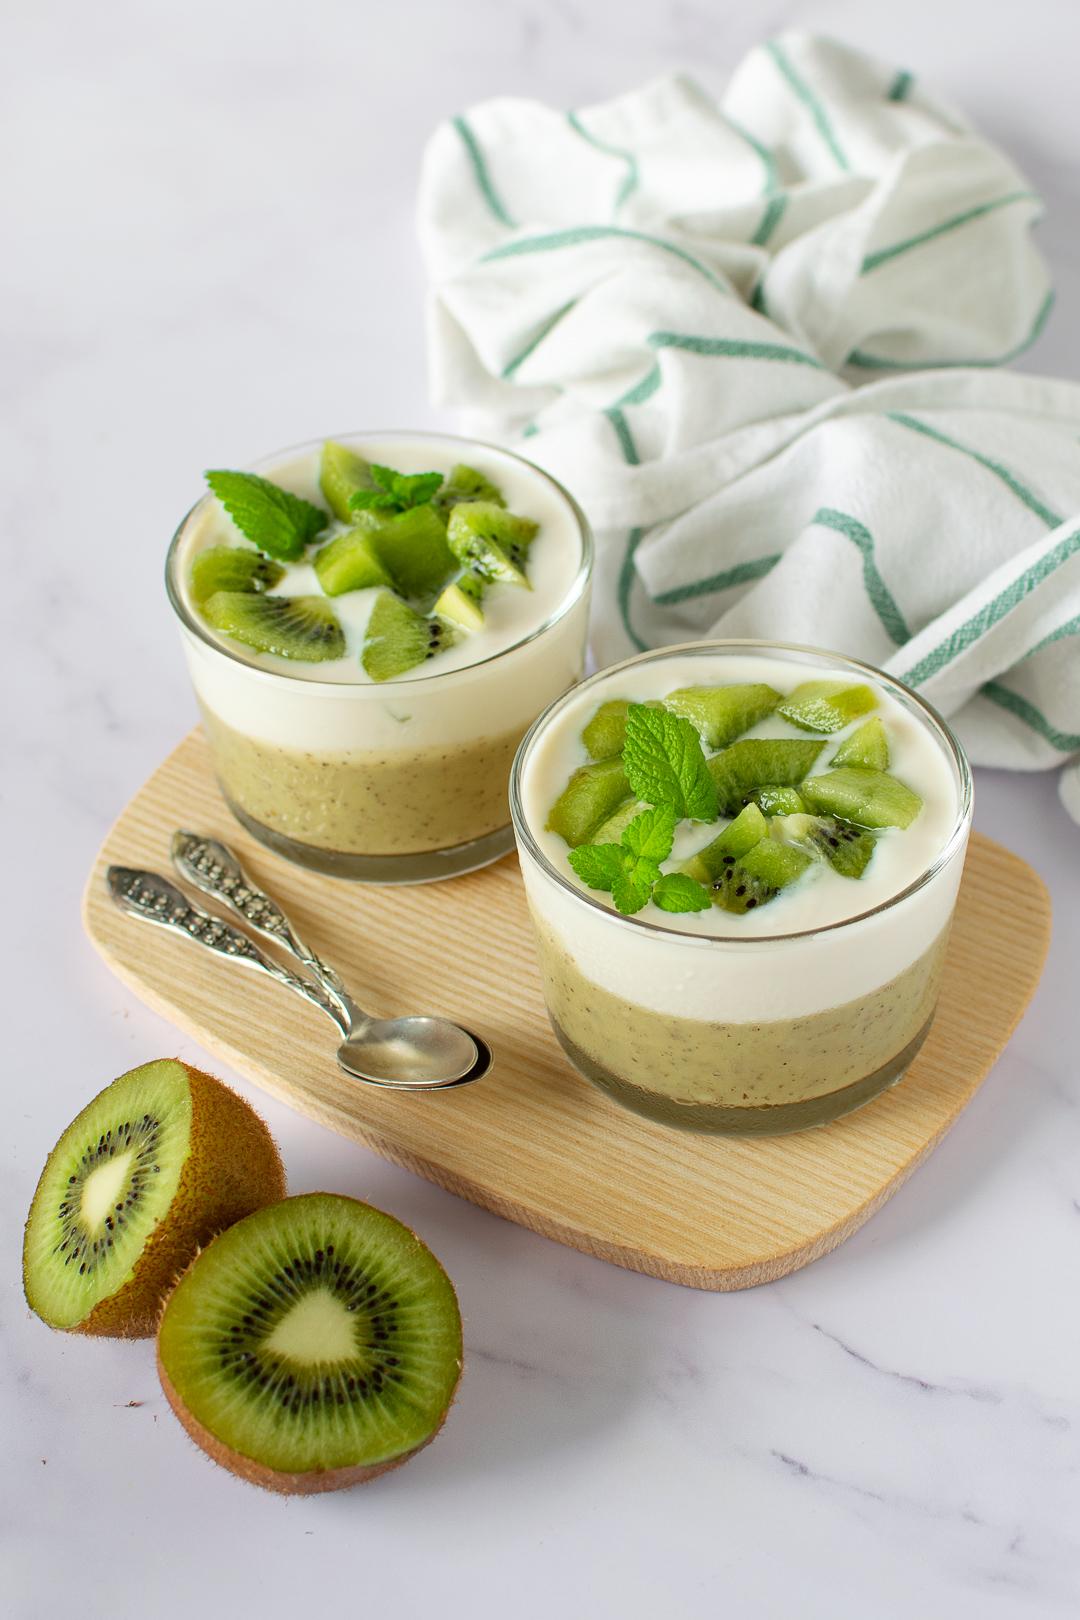 budini al kiwi con yogurt vegetale e kiwi a pezzetti